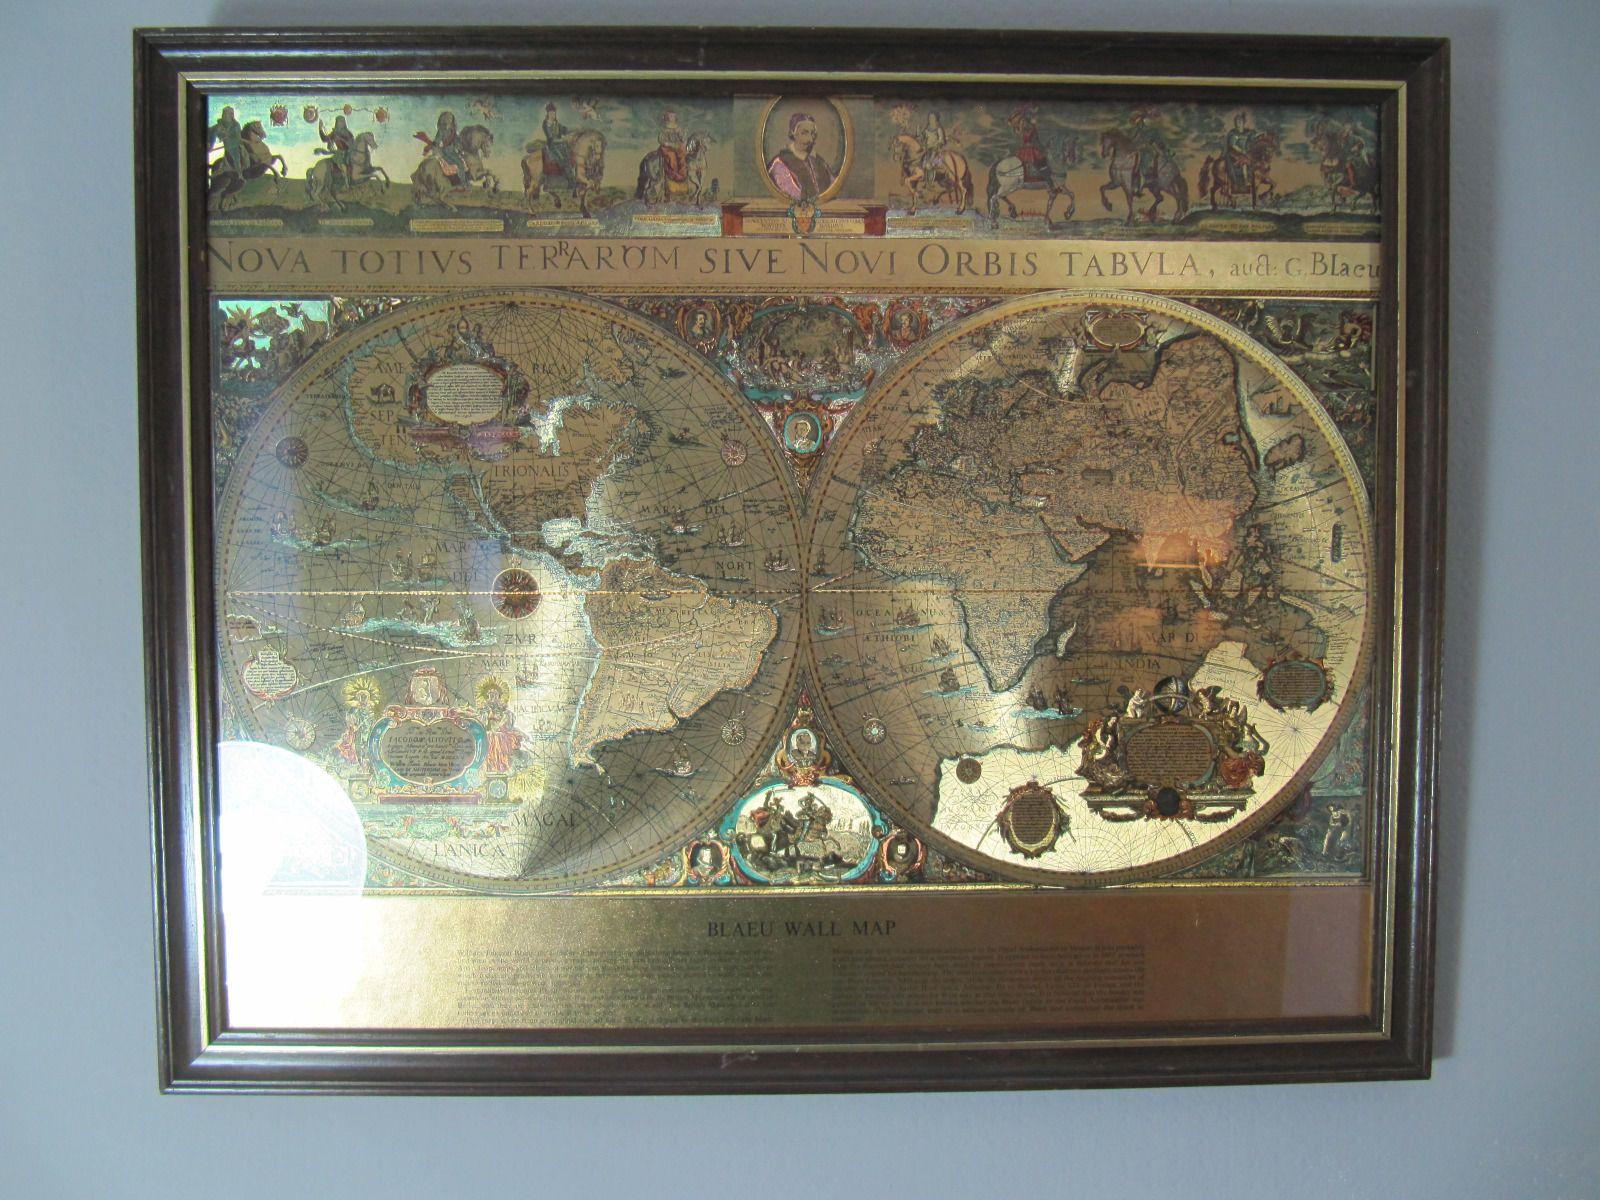 Blaeu wall map nova totivs terarom sive novi orbis tabvla framed blaeu wall map nova totivs terarom sive novi orbis tabvla framed ebay gumiabroncs Gallery